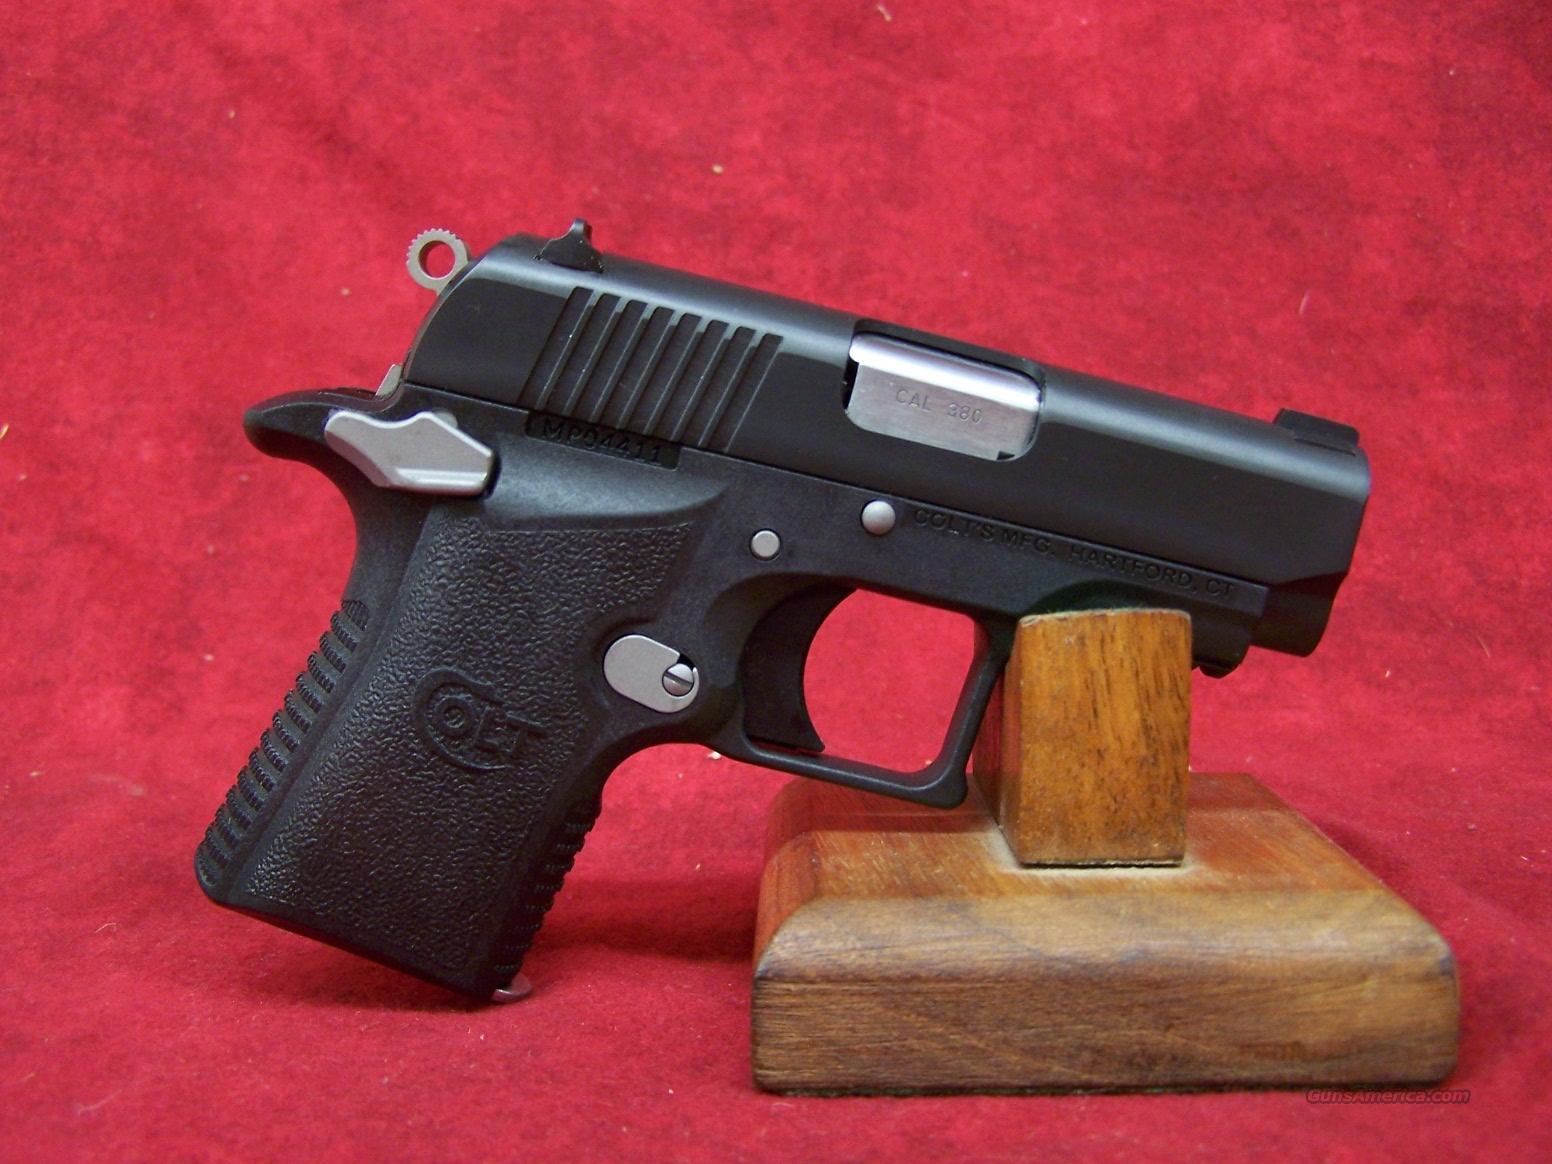 "Colt Mustang Pocketlite Polymer 2.75"" 380 Auto (06790)  Guns > Pistols > Colt Automatic Pistols (.25, .32, & .380 cal)"